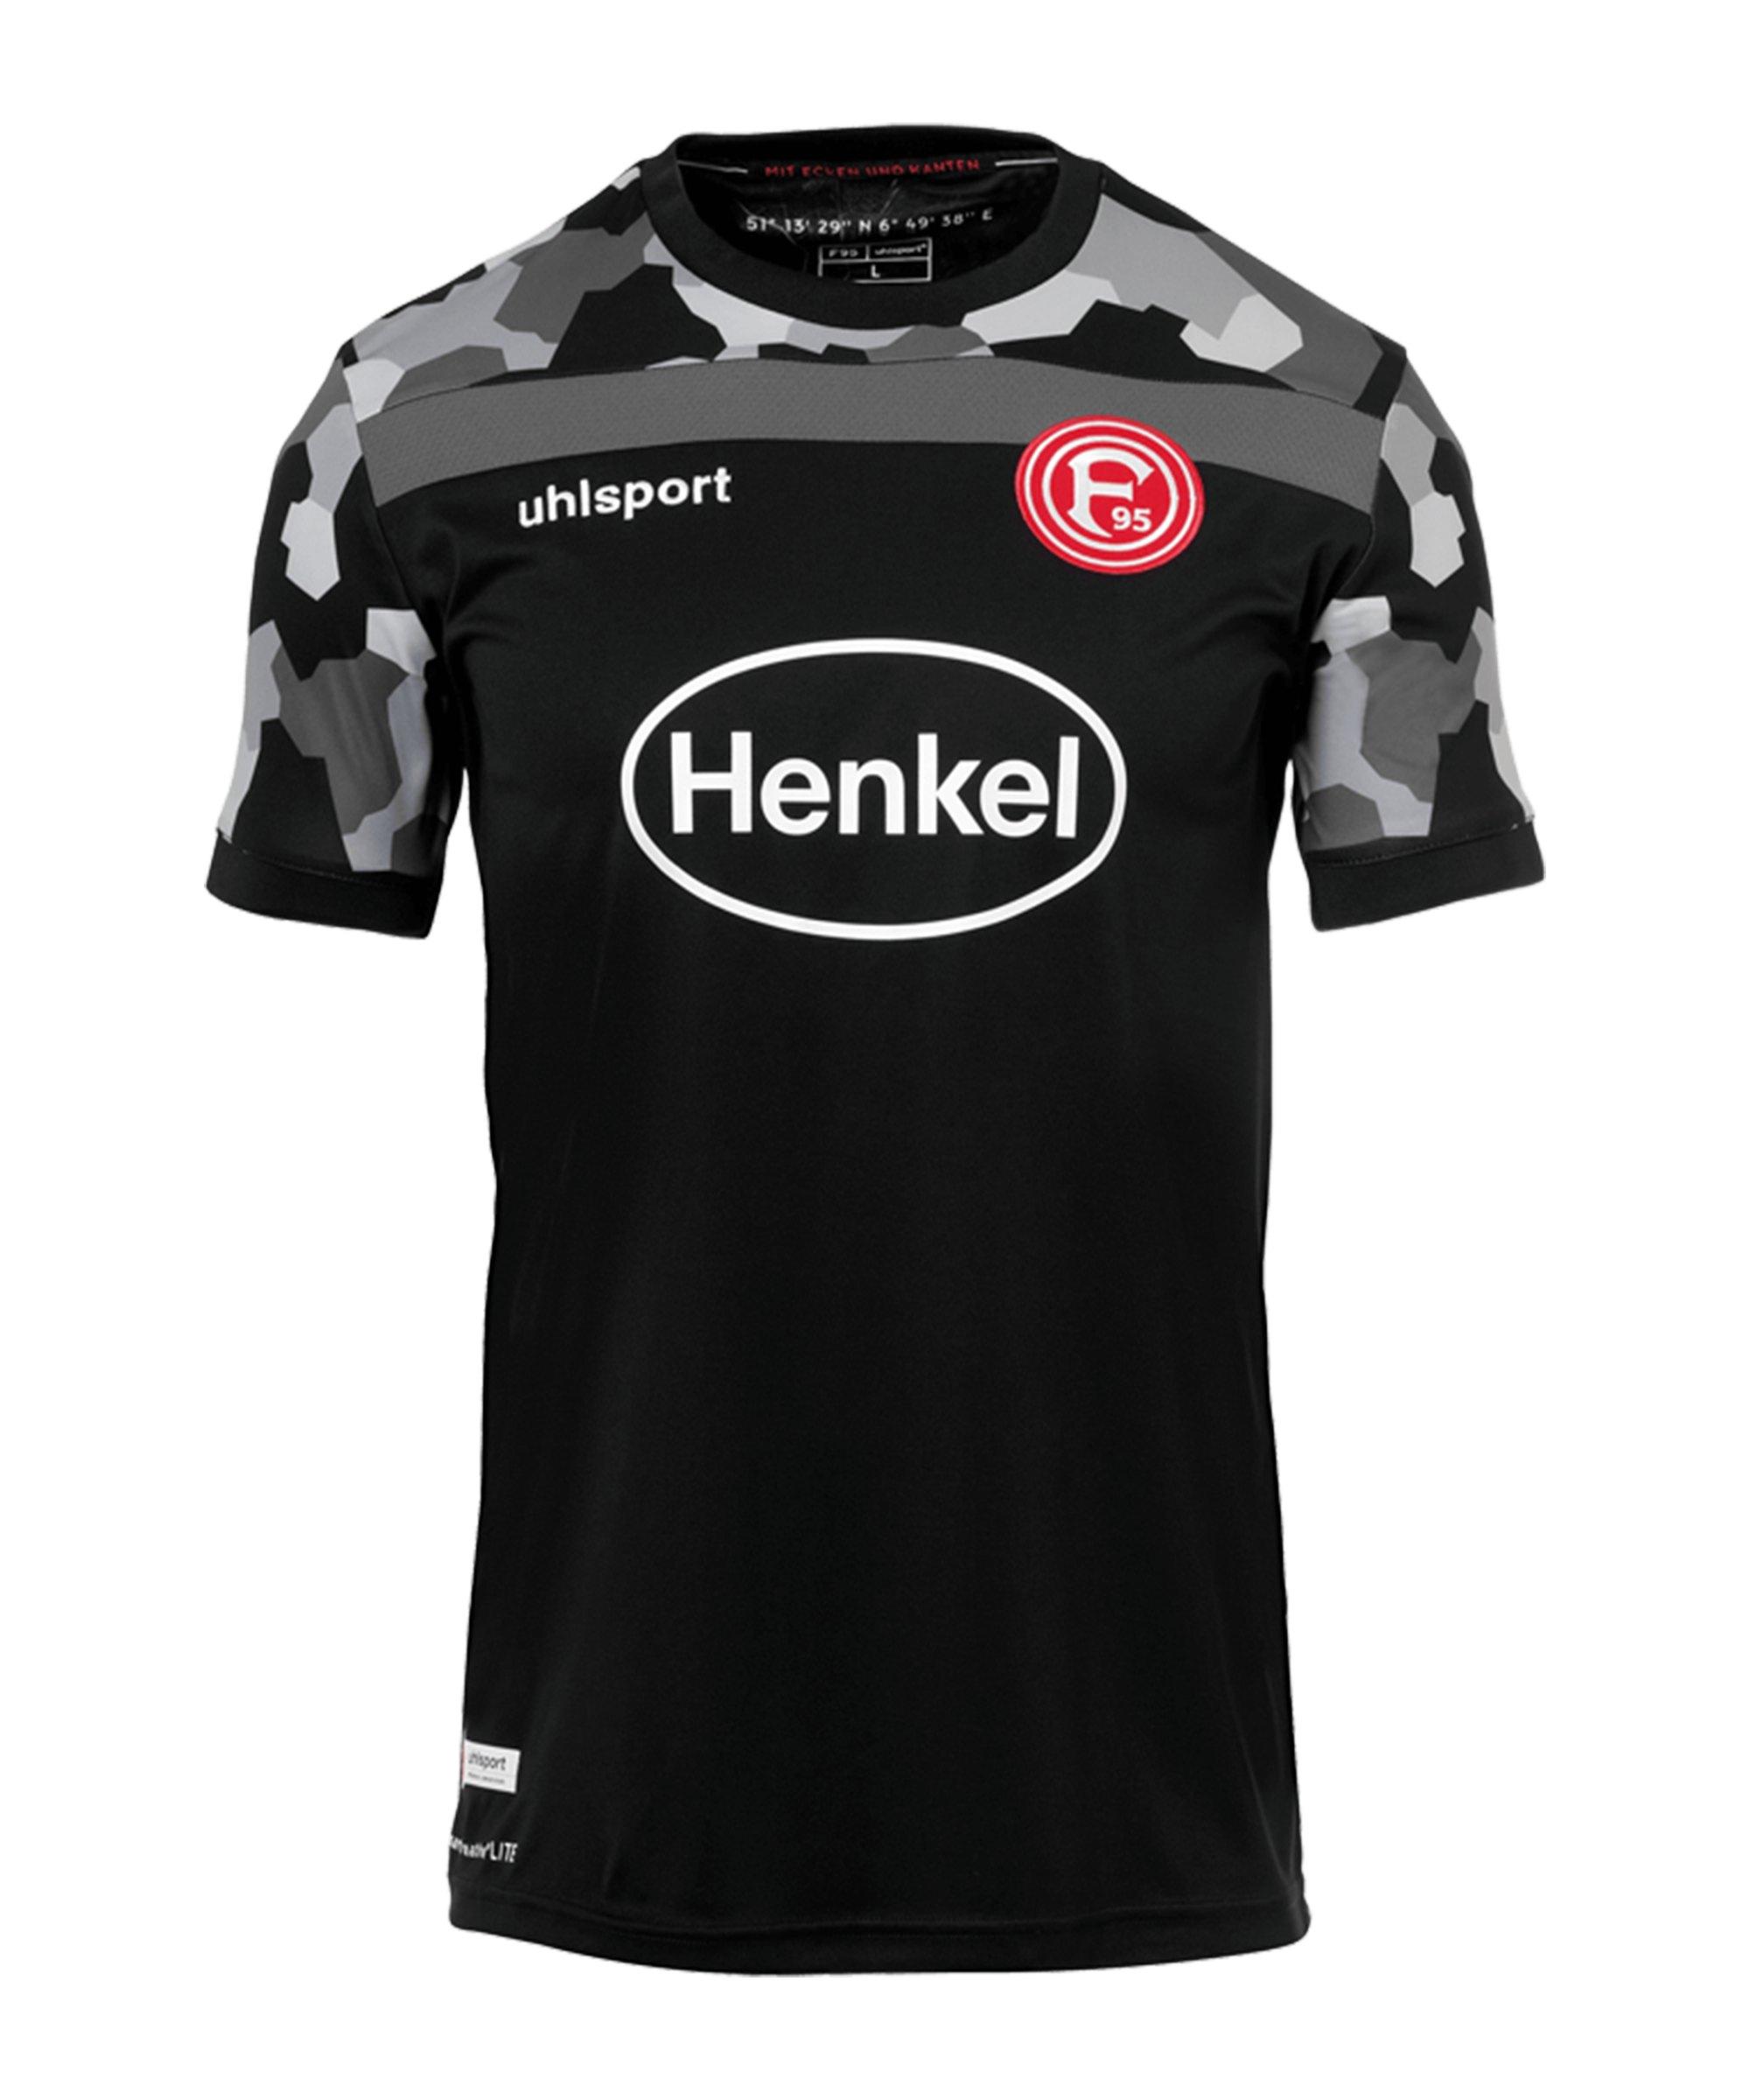 Uhlsport Fortuna Düsseldorf Trikot 3rd 2020/2021 - schwarz